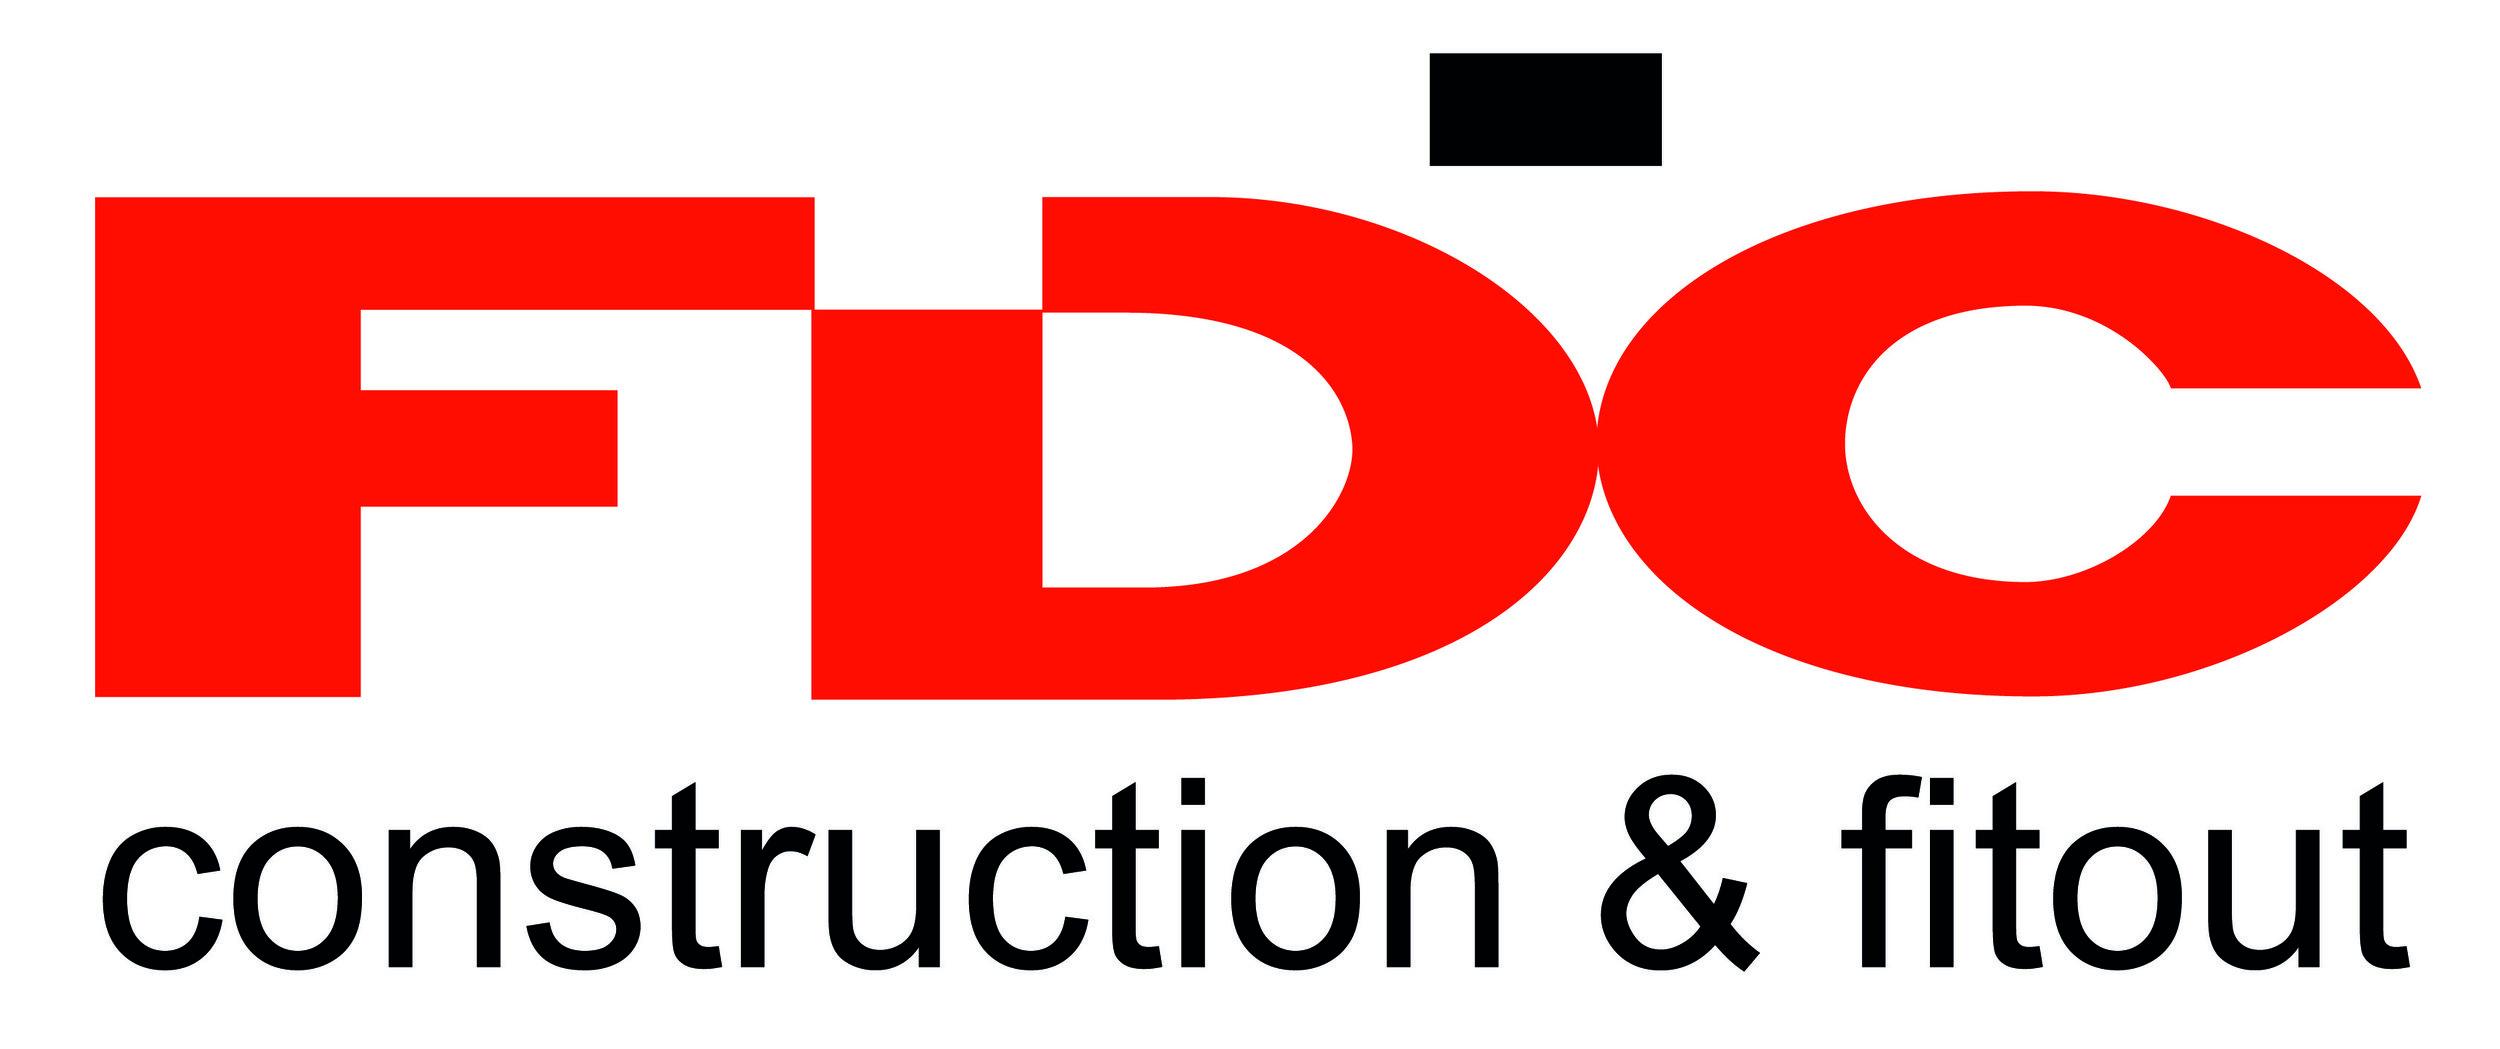 FDC Website Logo.jpg